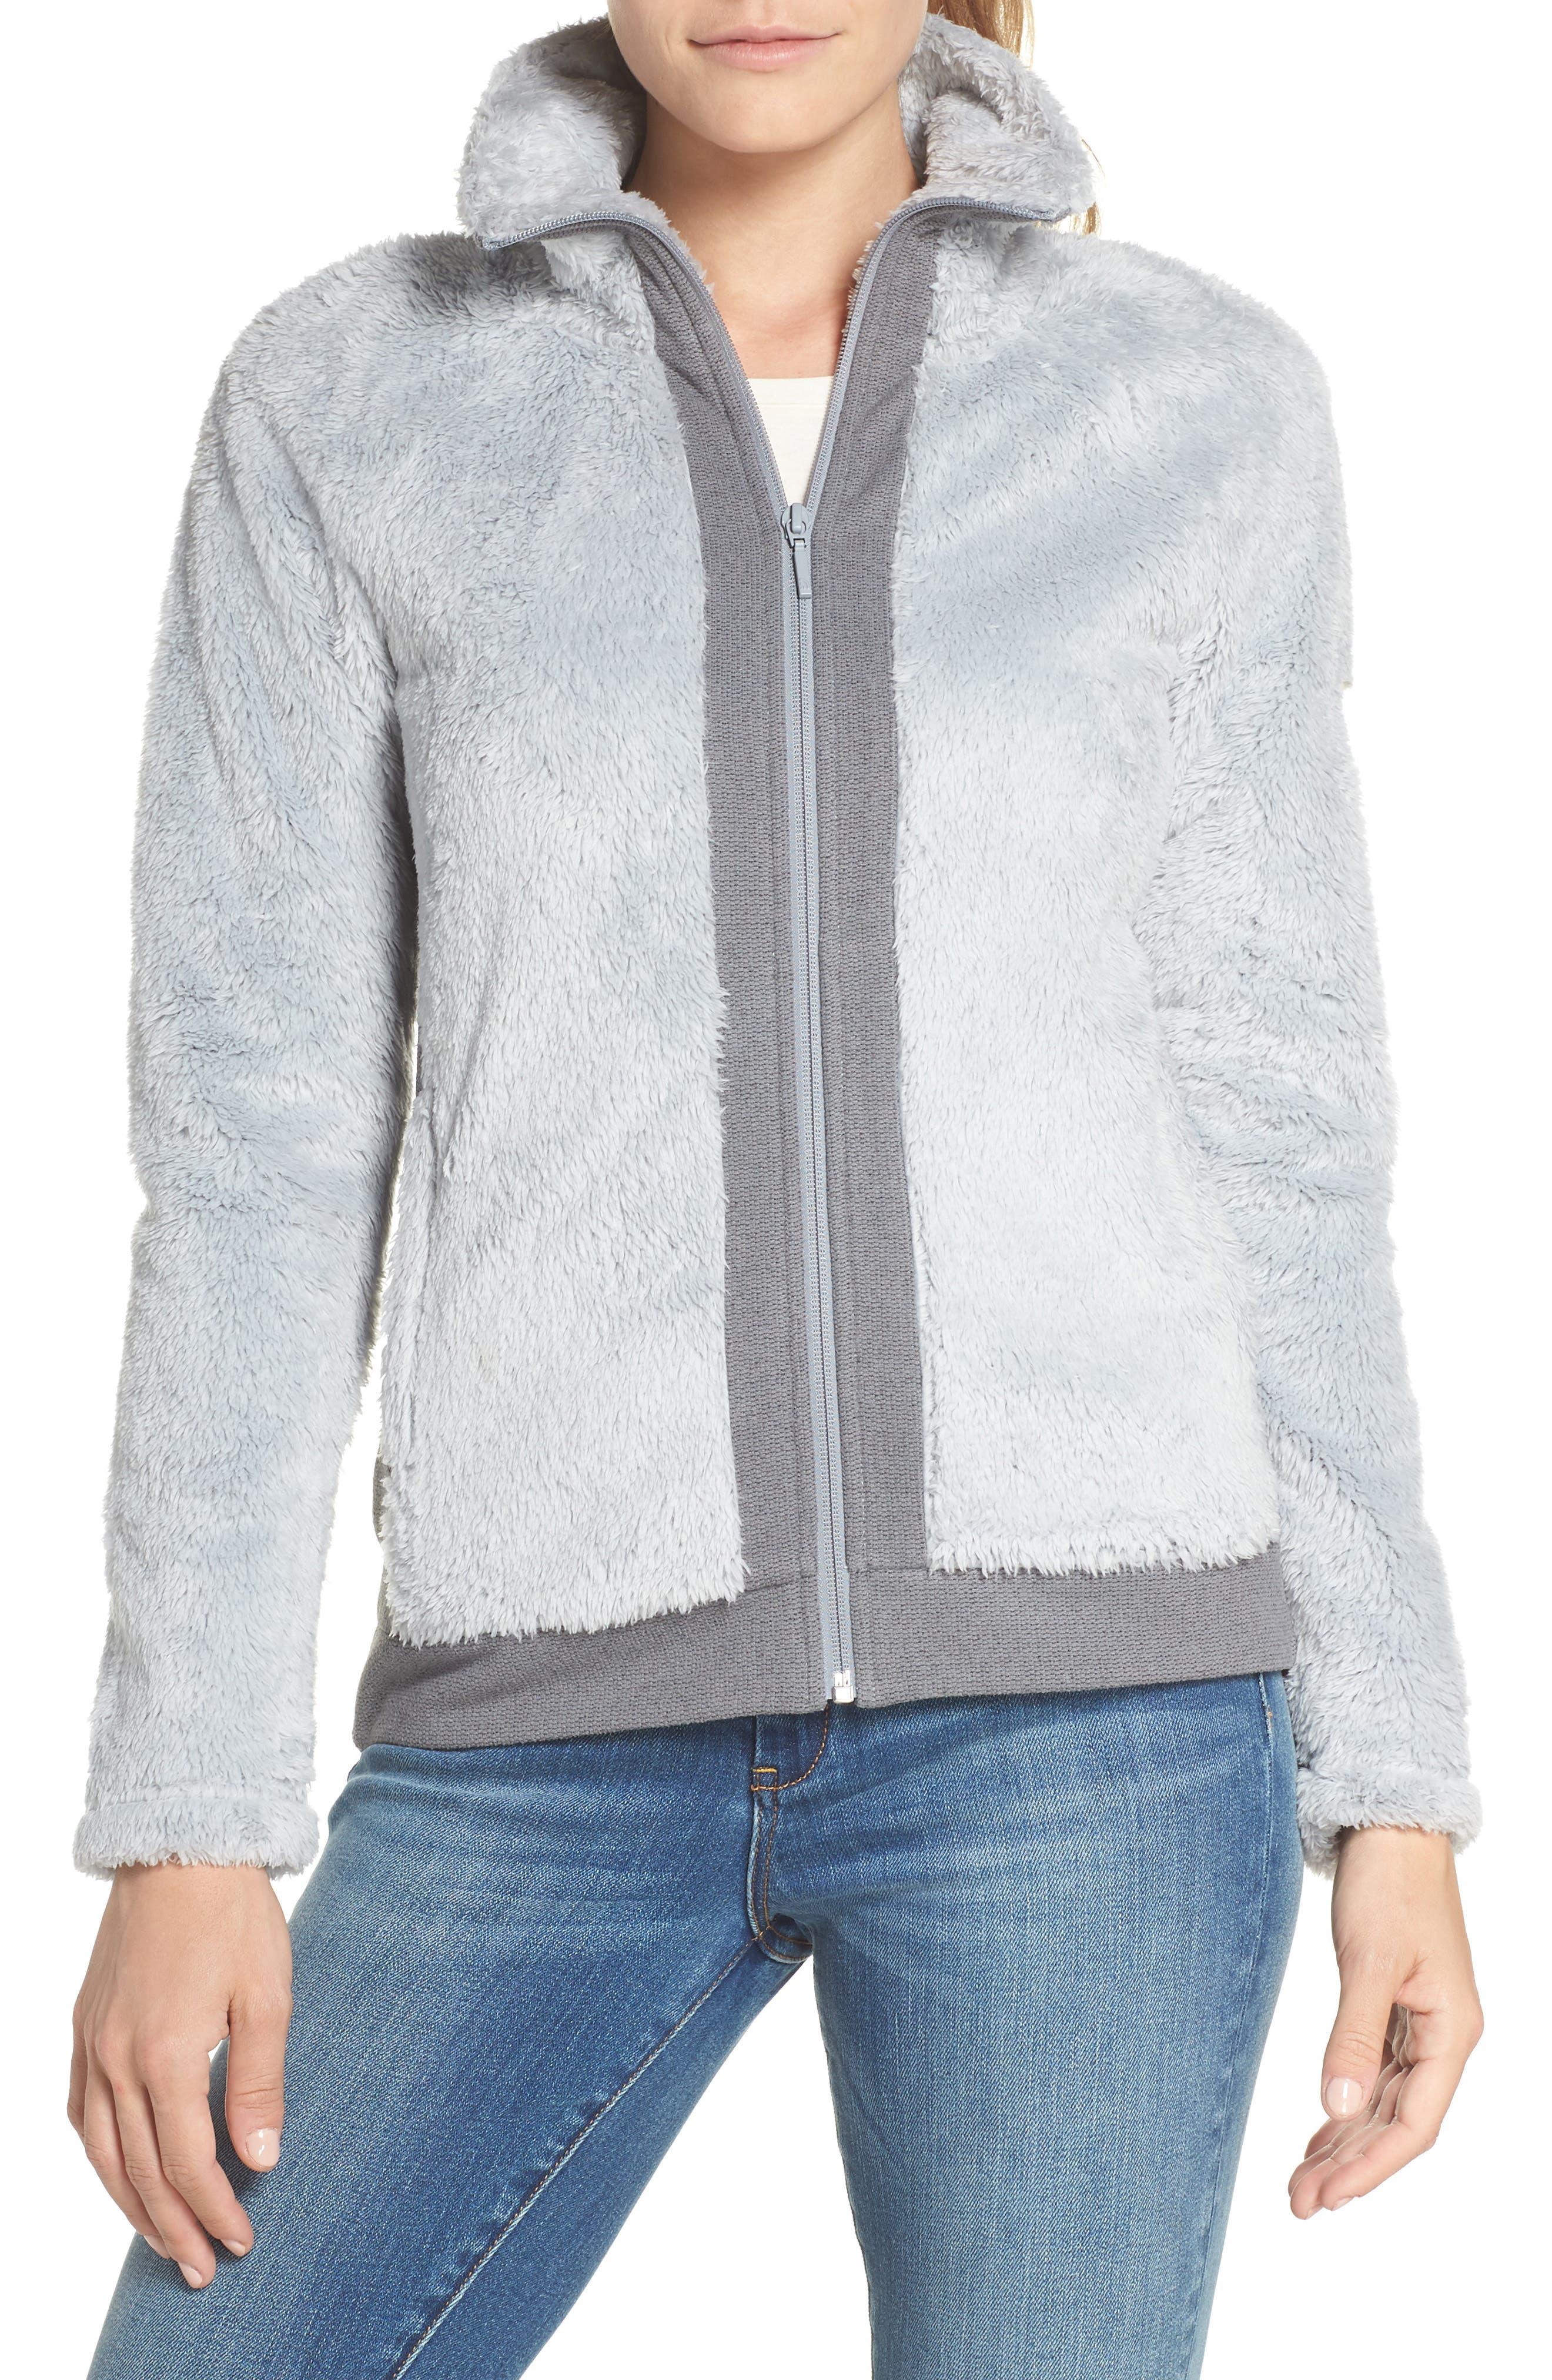 Furry Fleece Jacket,                         Main,                         color, High Rise Grey